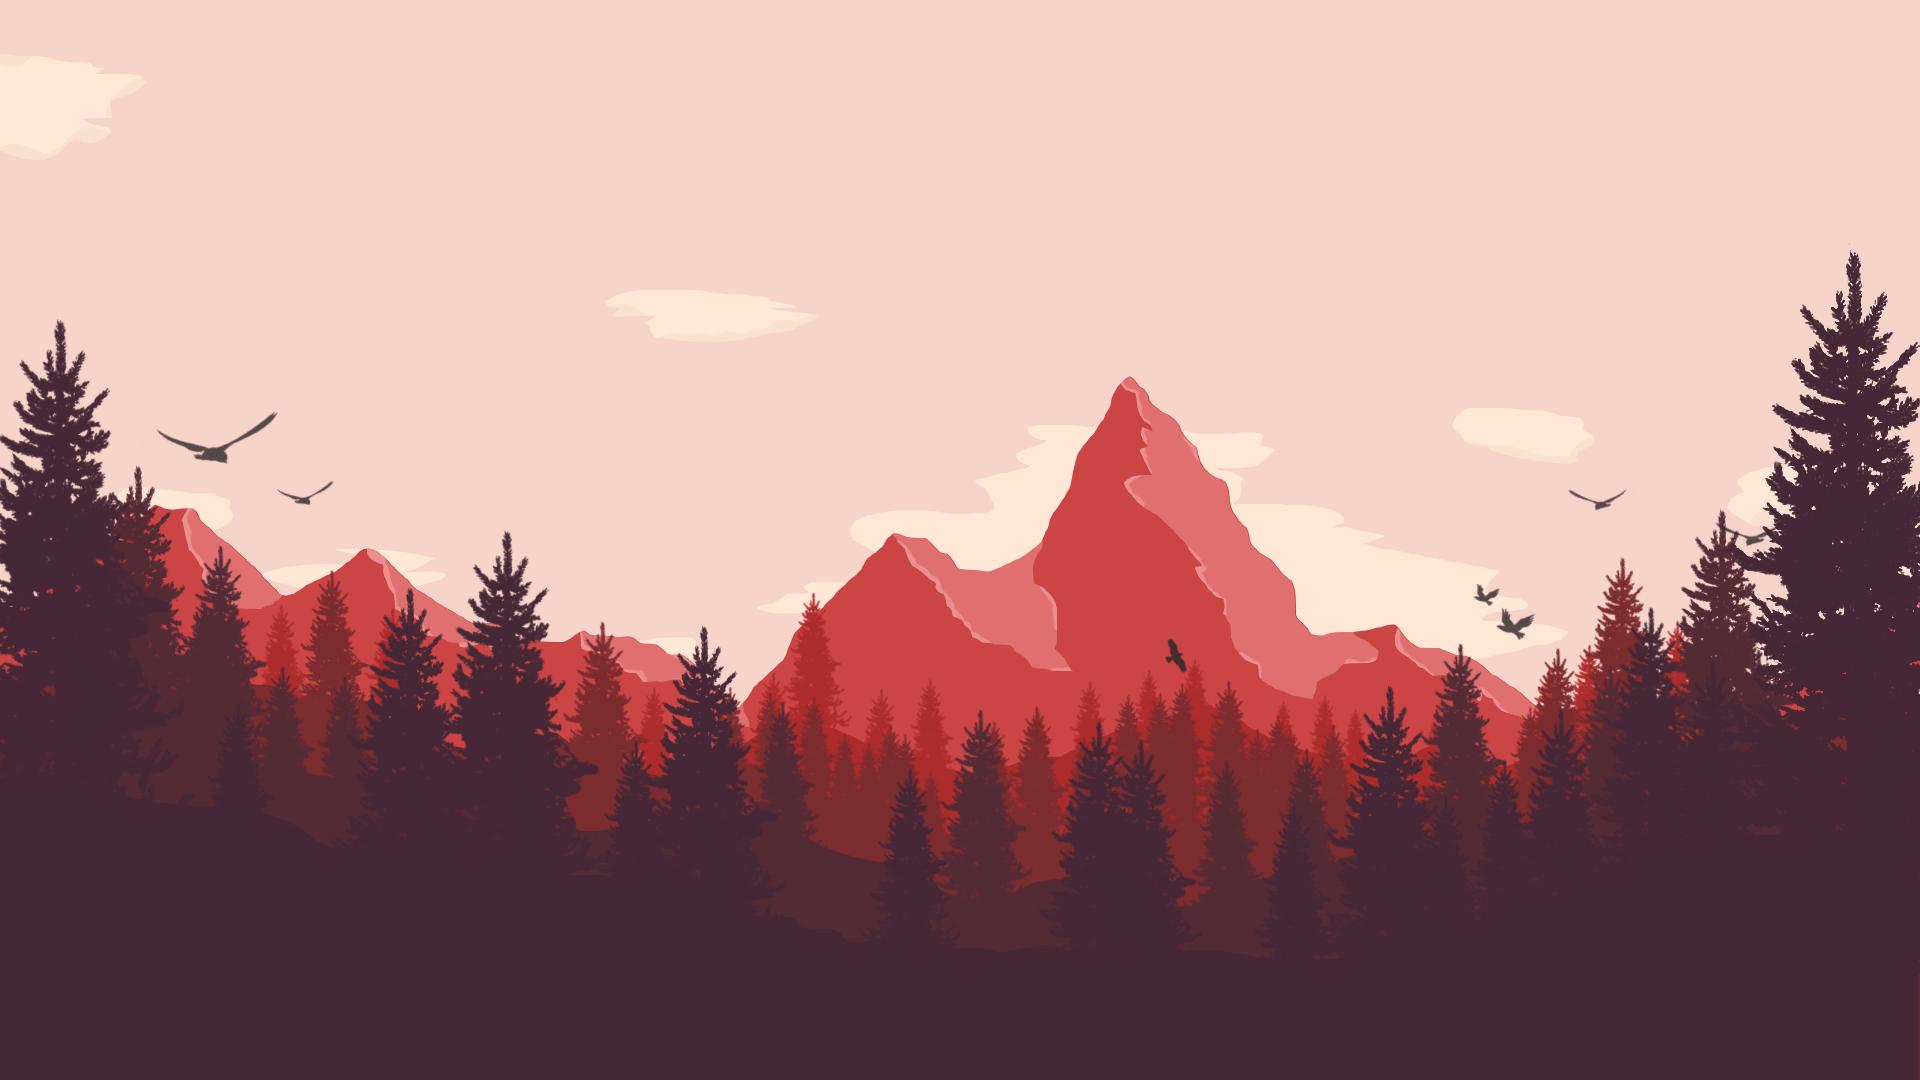 1920 x 1080 Mountains, Low Poly, Desktop Wallpaper! This